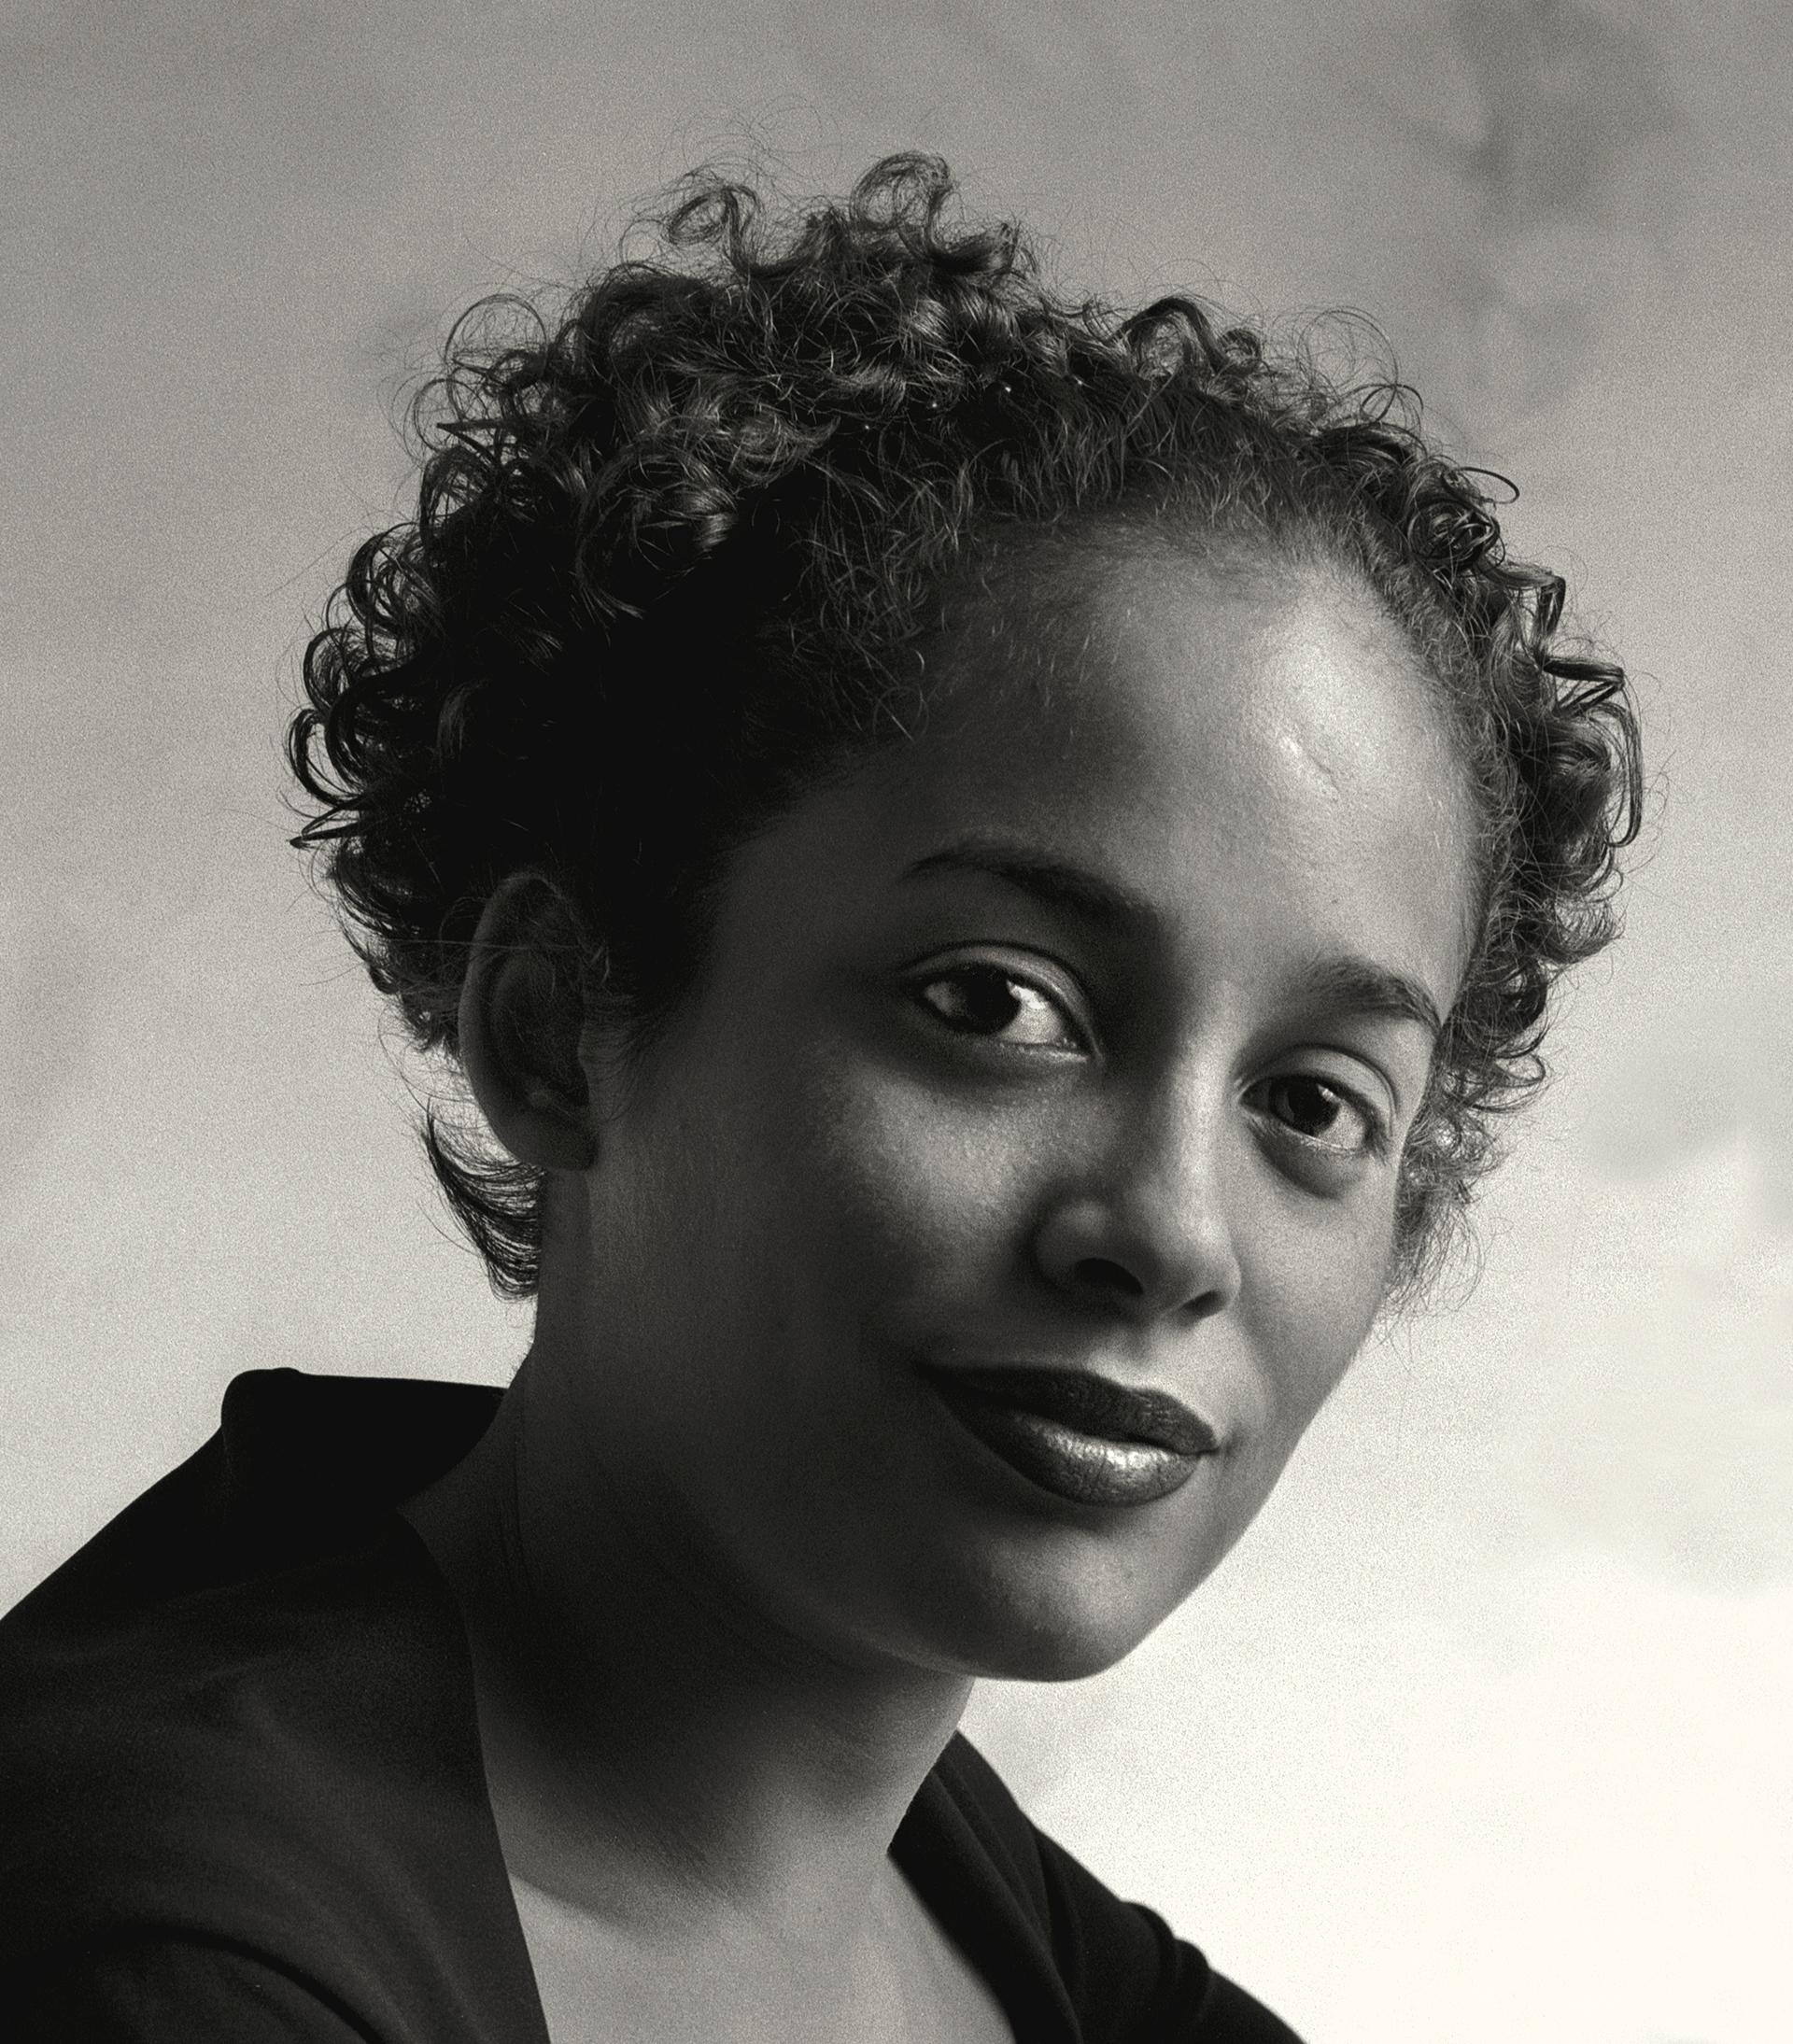 Ebelin Ortiz in my studio | Circa 2000 © Coco Martin Shot on medium format, black and white film